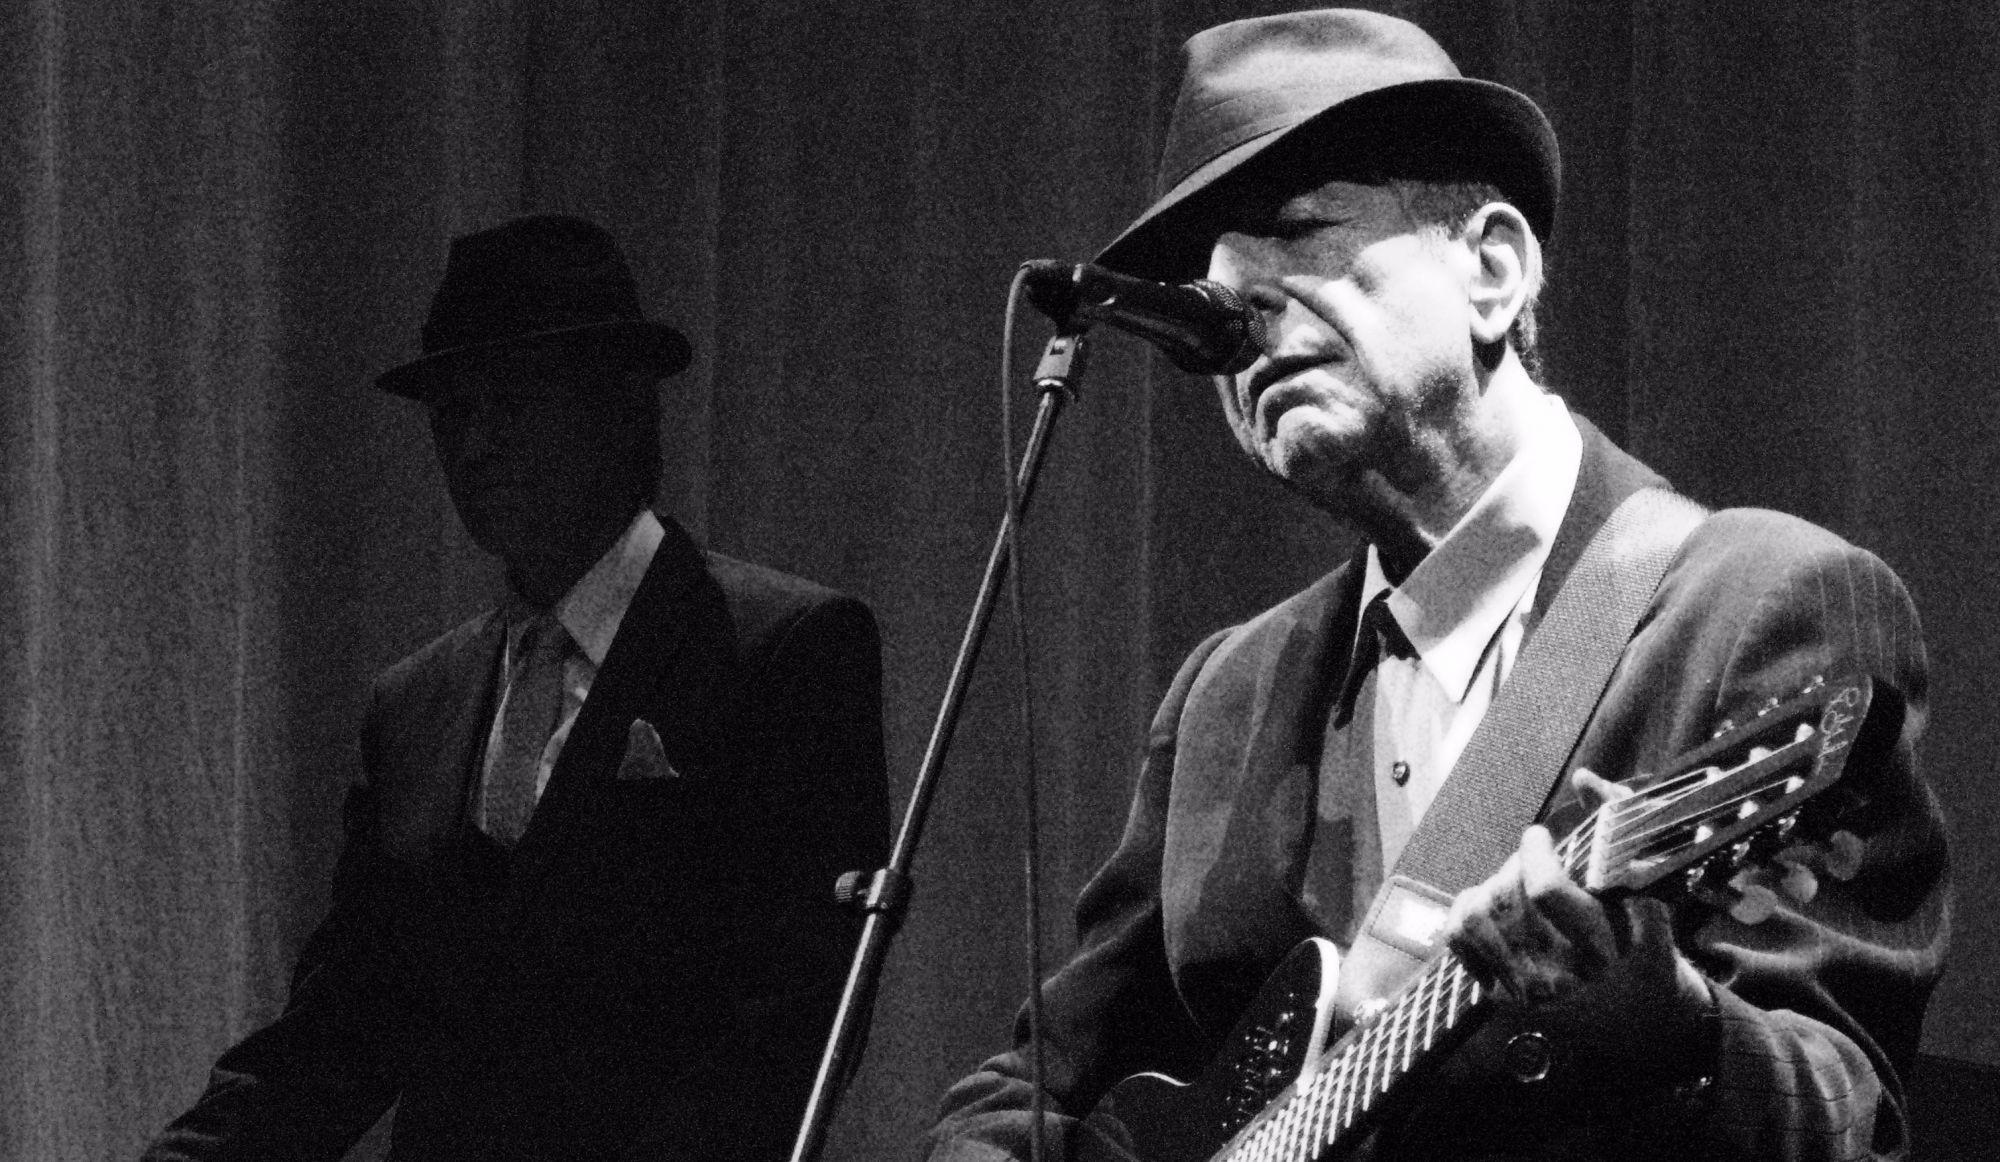 Leonard Cohen's Final Book due in 2018